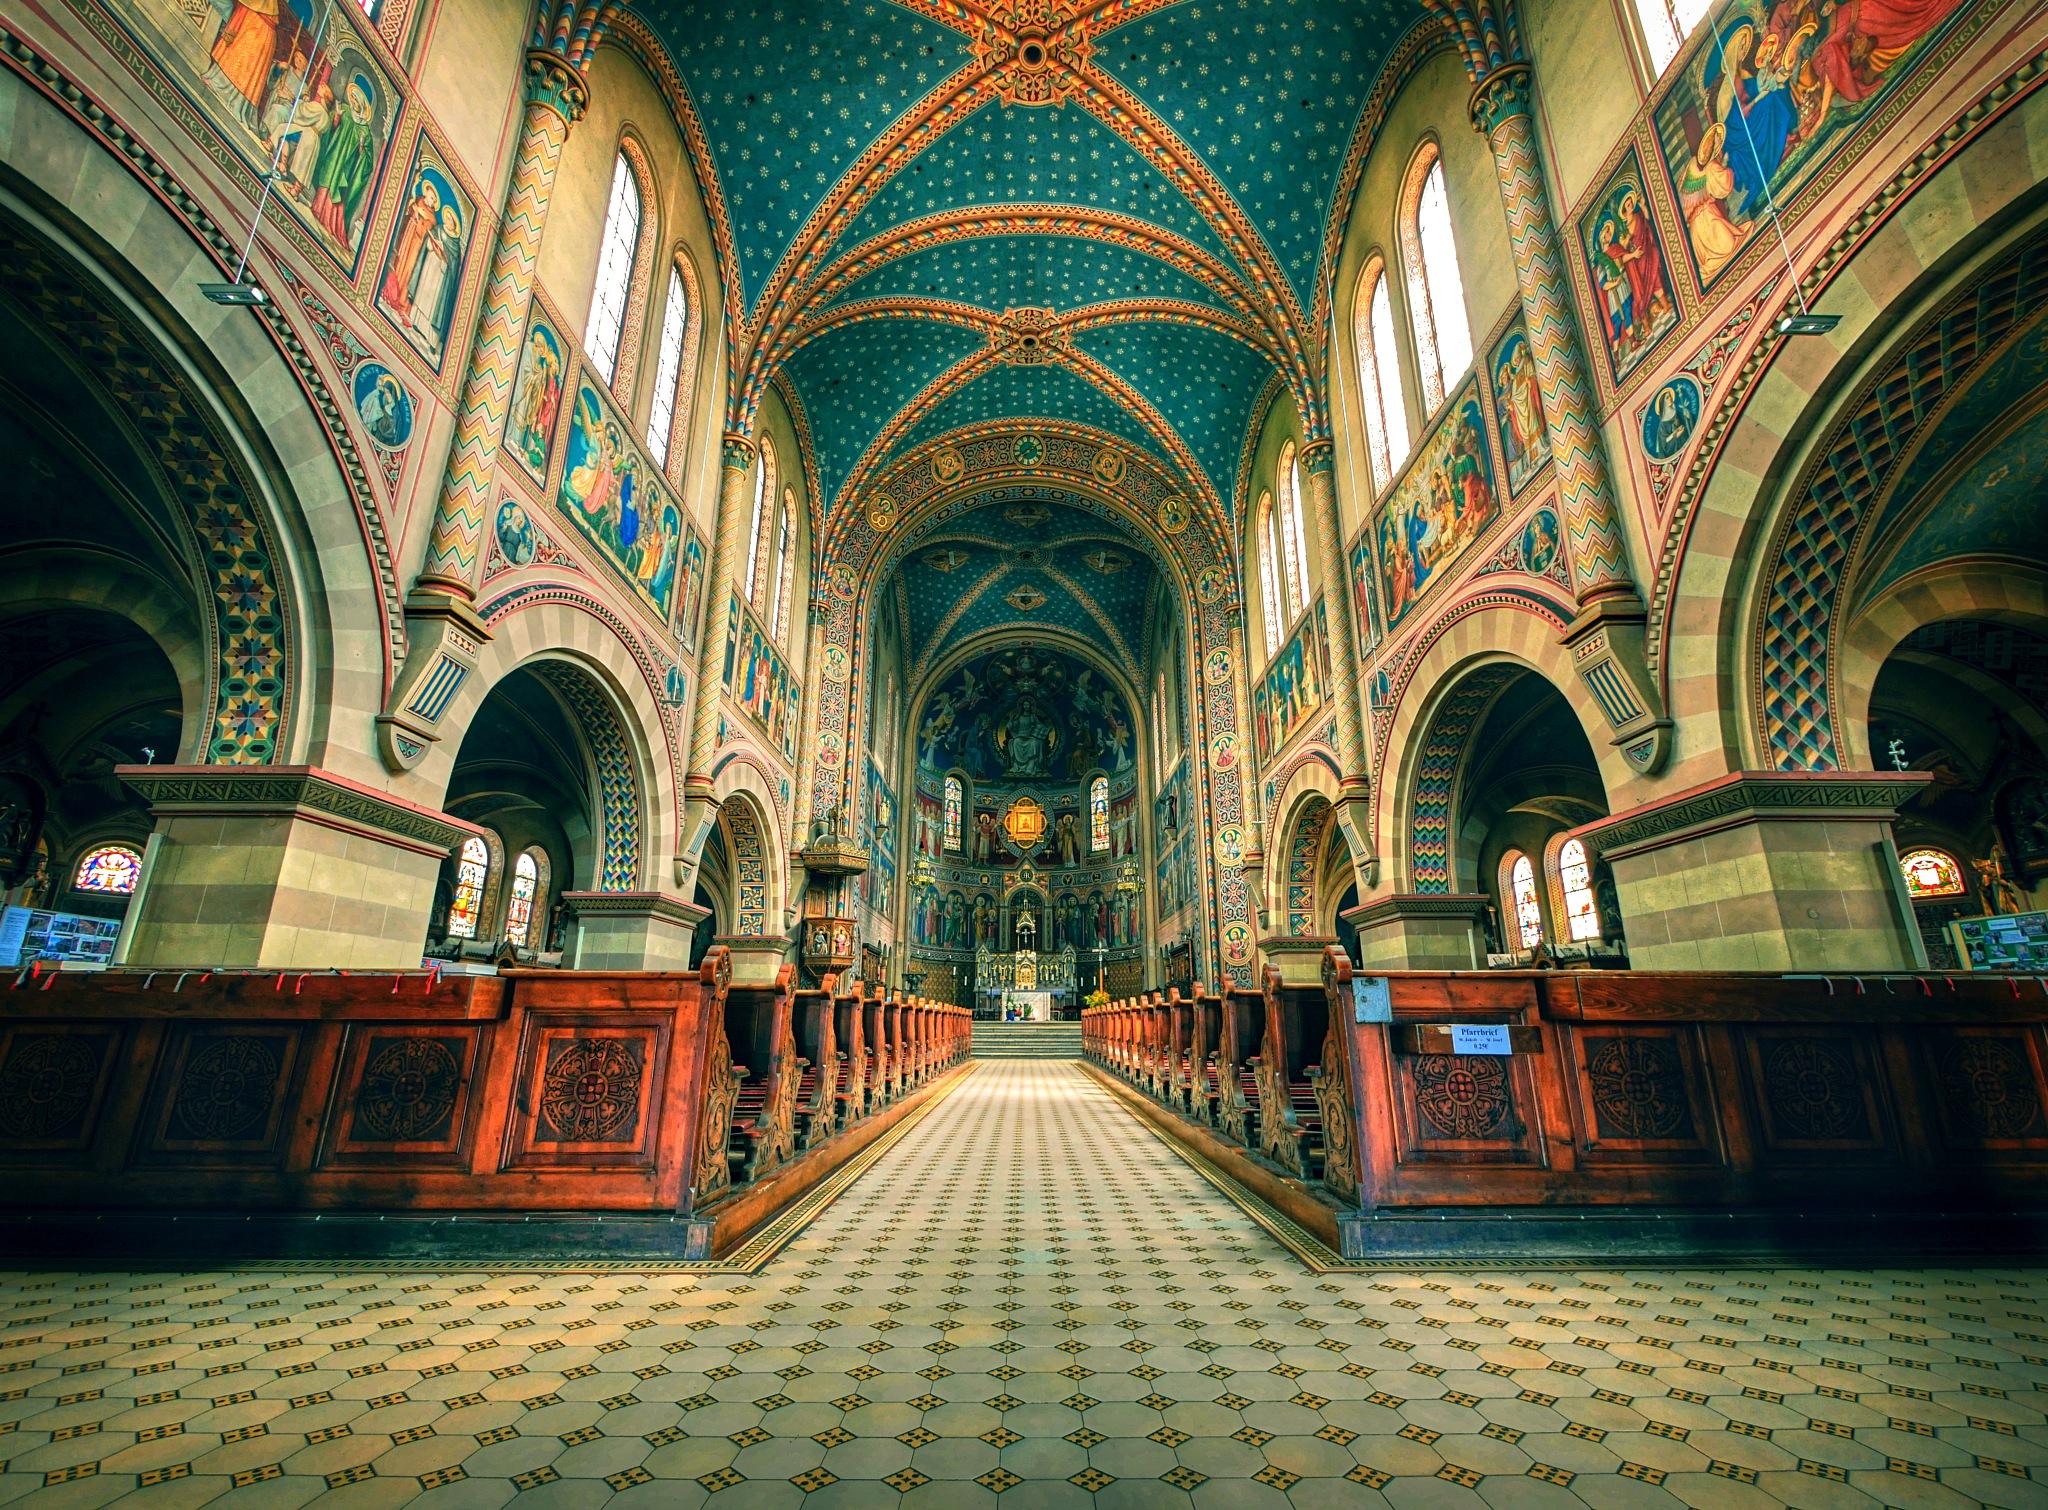 Klosterkirche Maria Hilf by David Capone